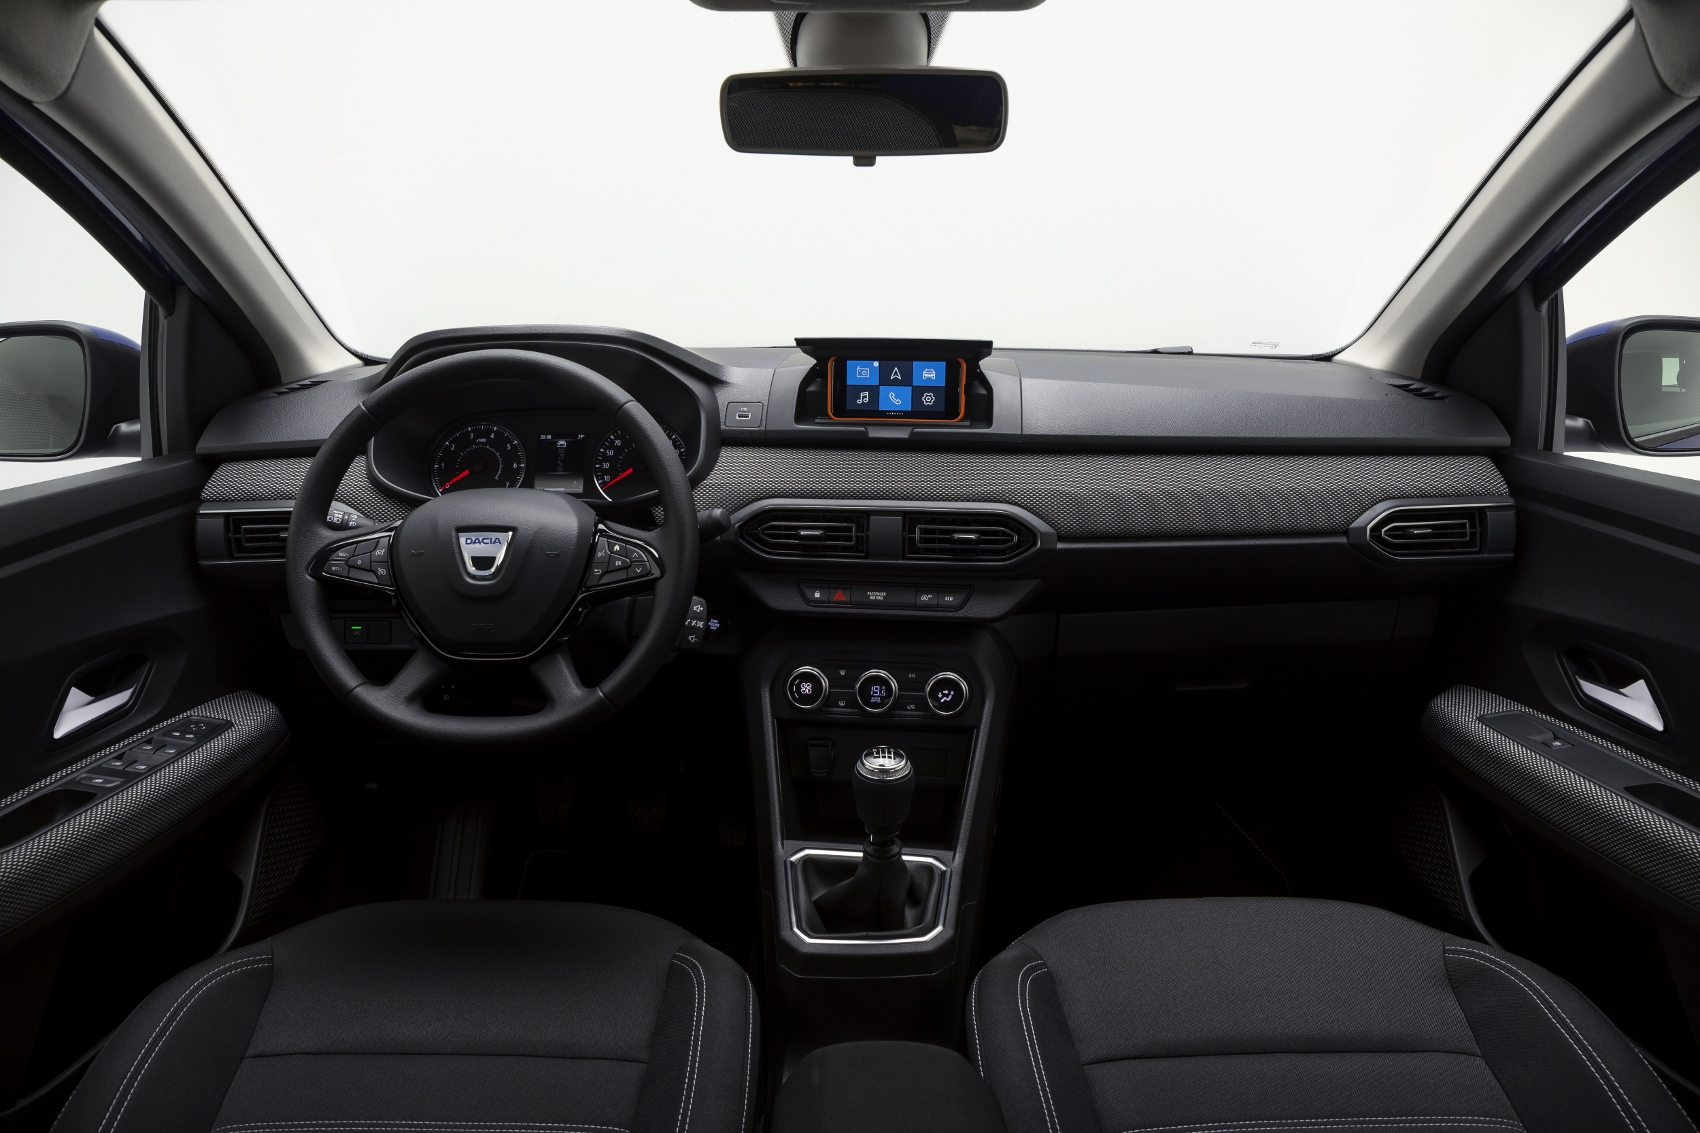 2020 - New Dacia SANDERO (7) (1700x1133)